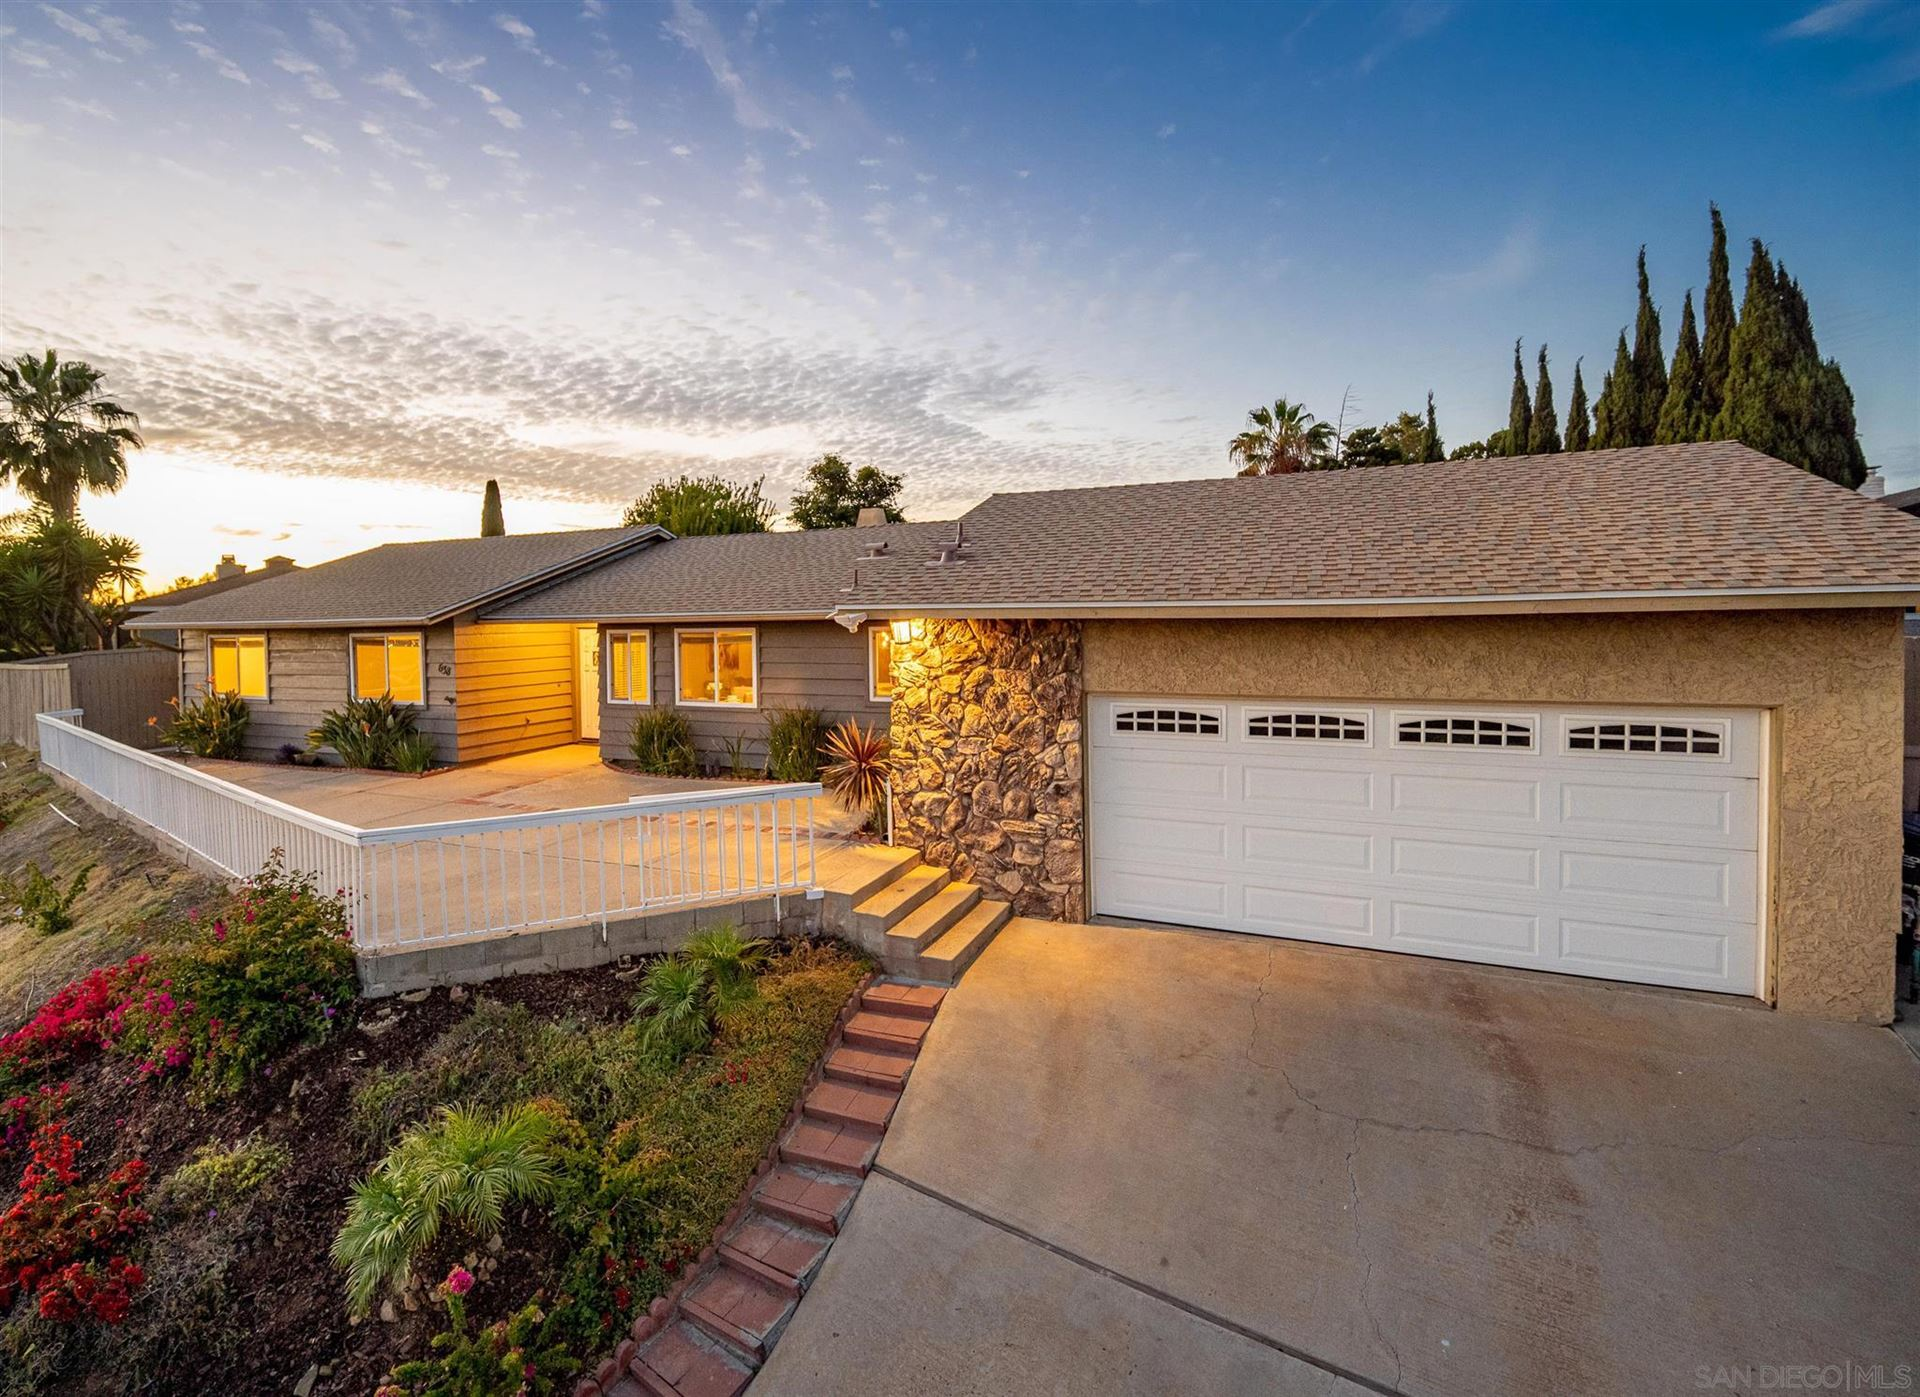 Photo of 638 Cortez Ave, Vista, CA 92084 (MLS # 210015963)